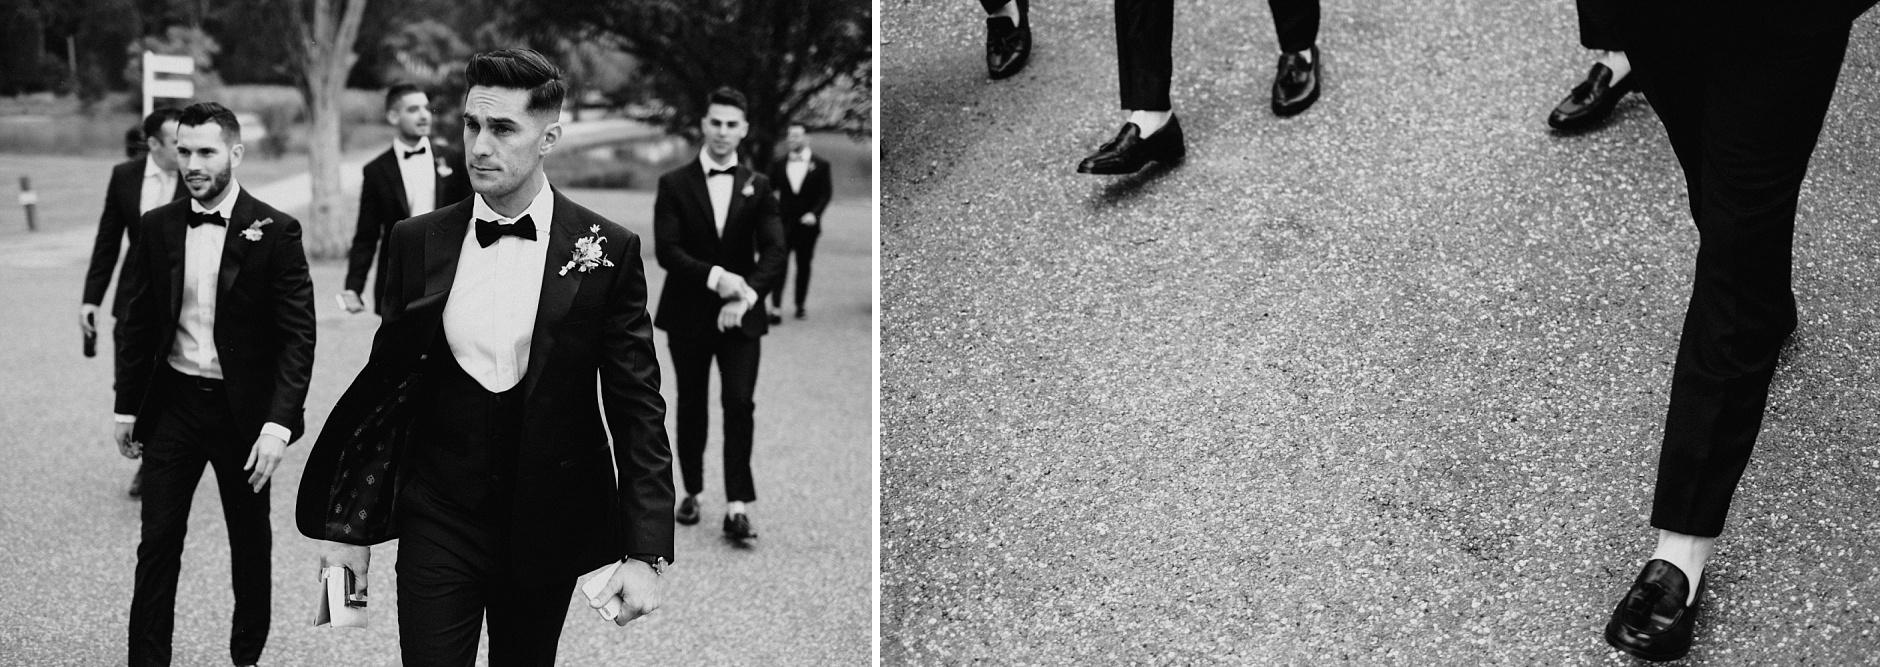 cassandra&cameron0286ab_Peppers-Creek-Wedding.jpg